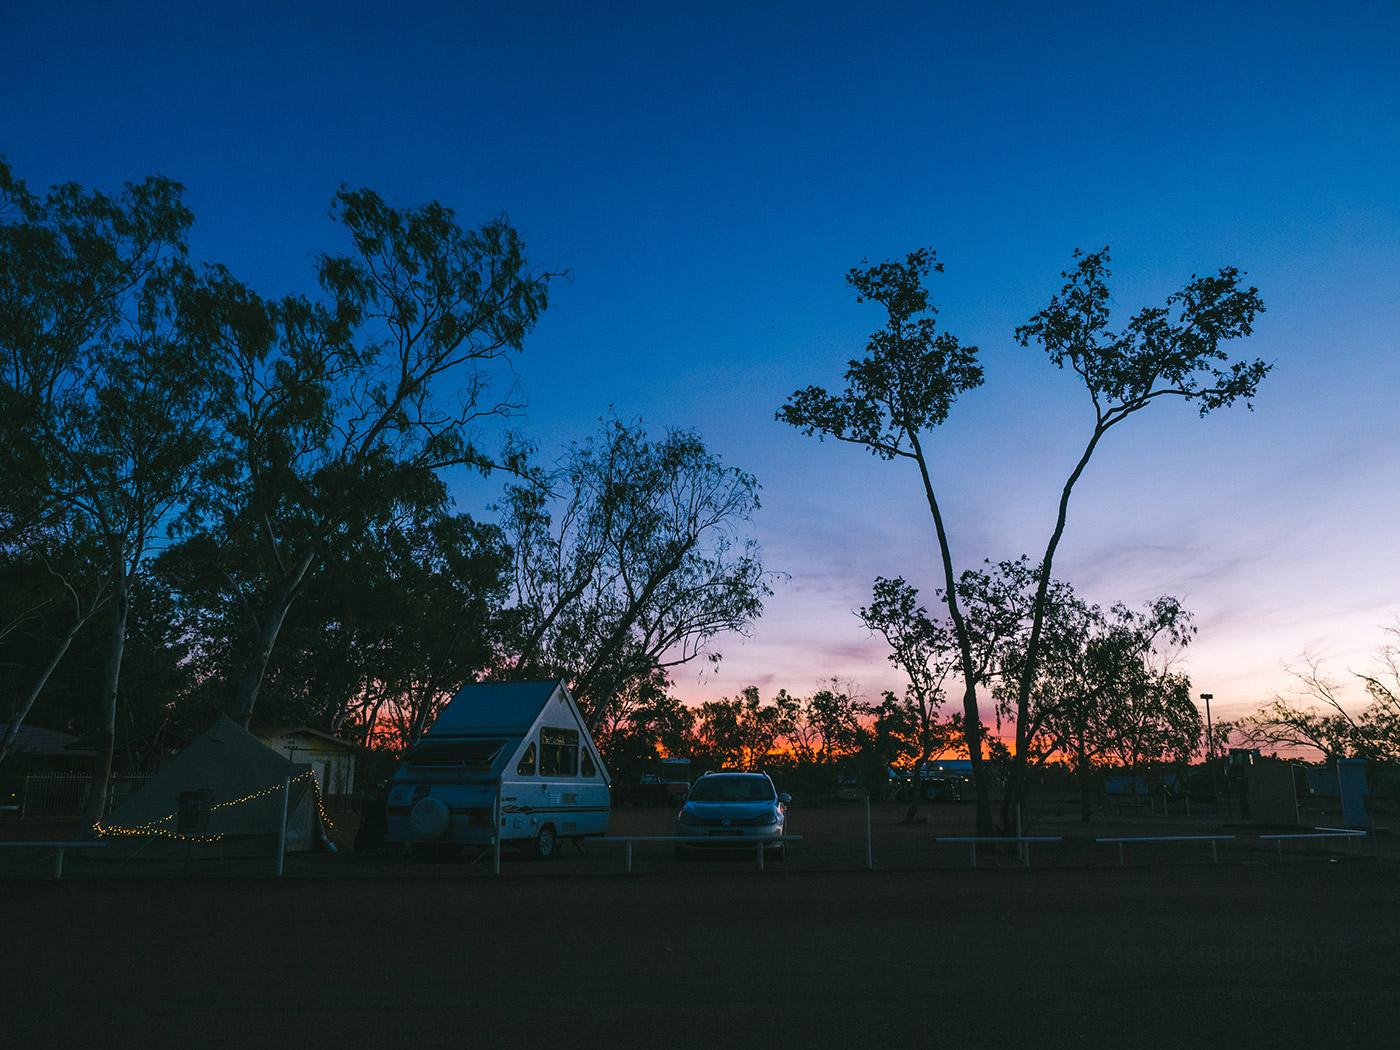 NT Australia - Outback Caravan Park - Sunset